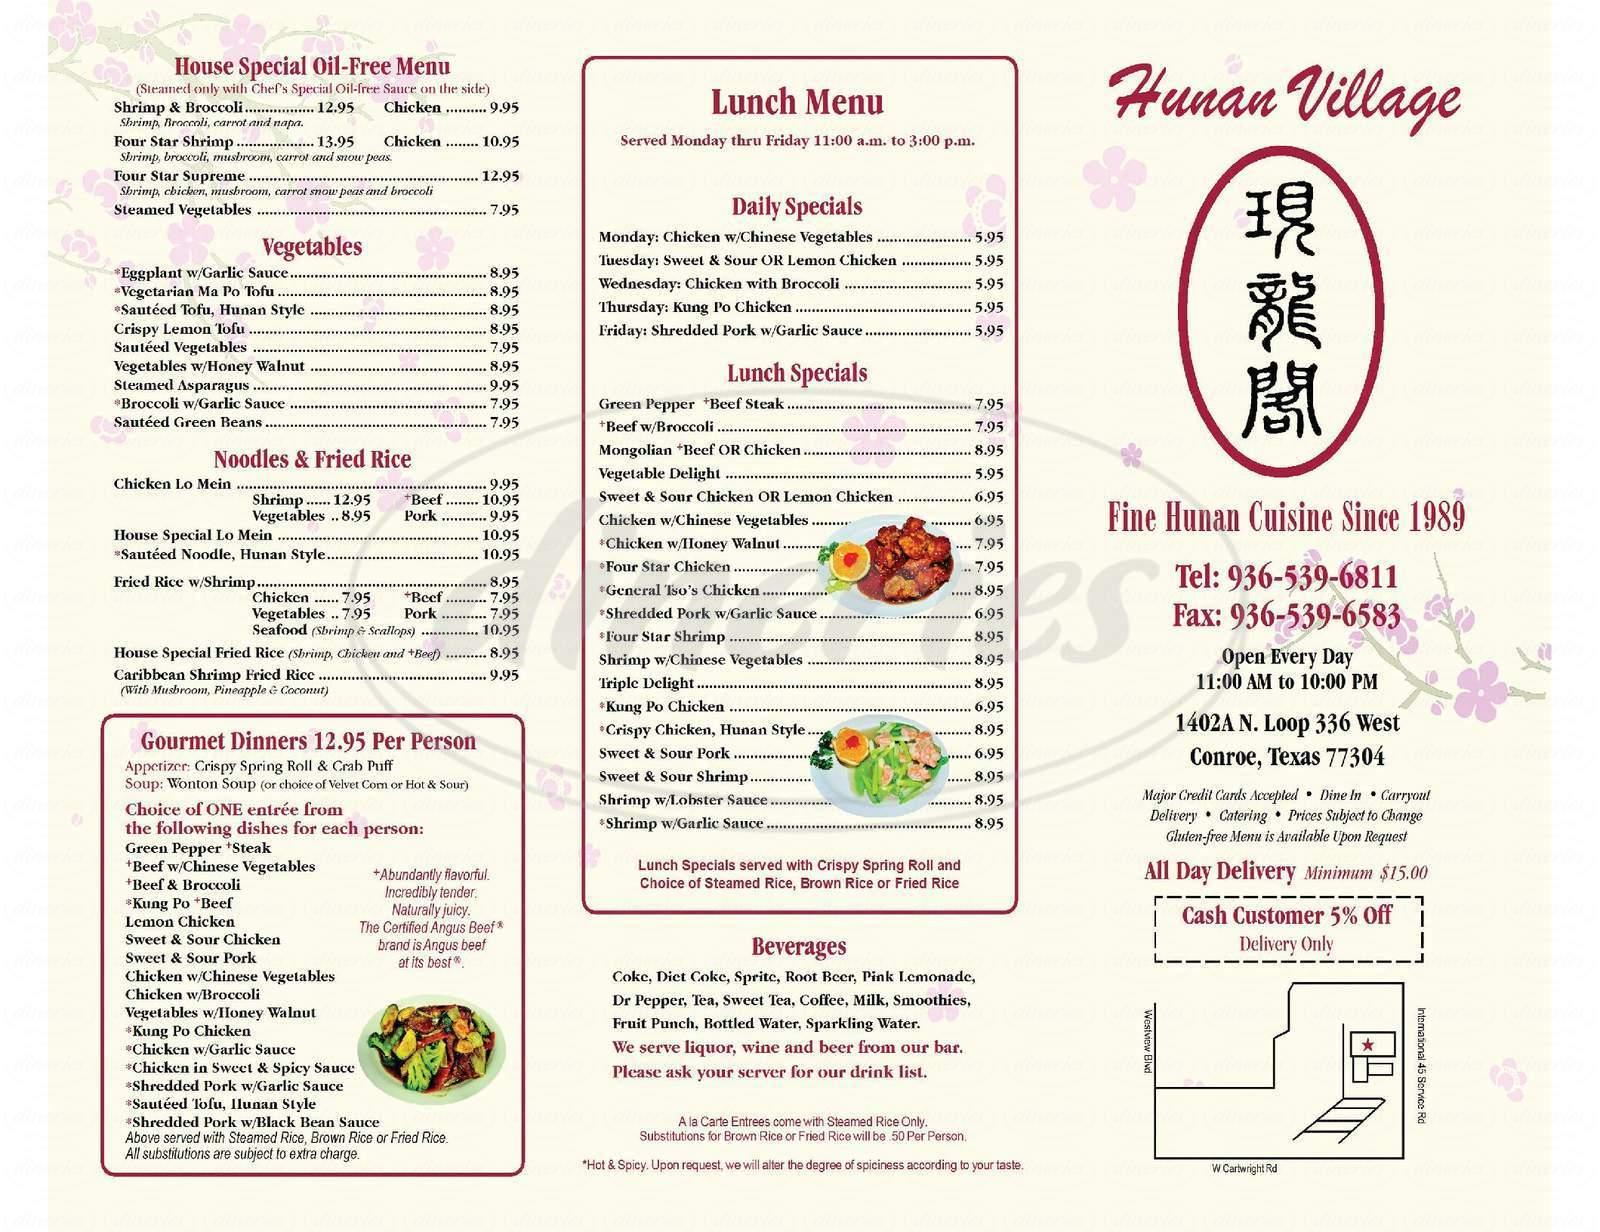 Big menu for Hunan Village Restaurant, Conroe